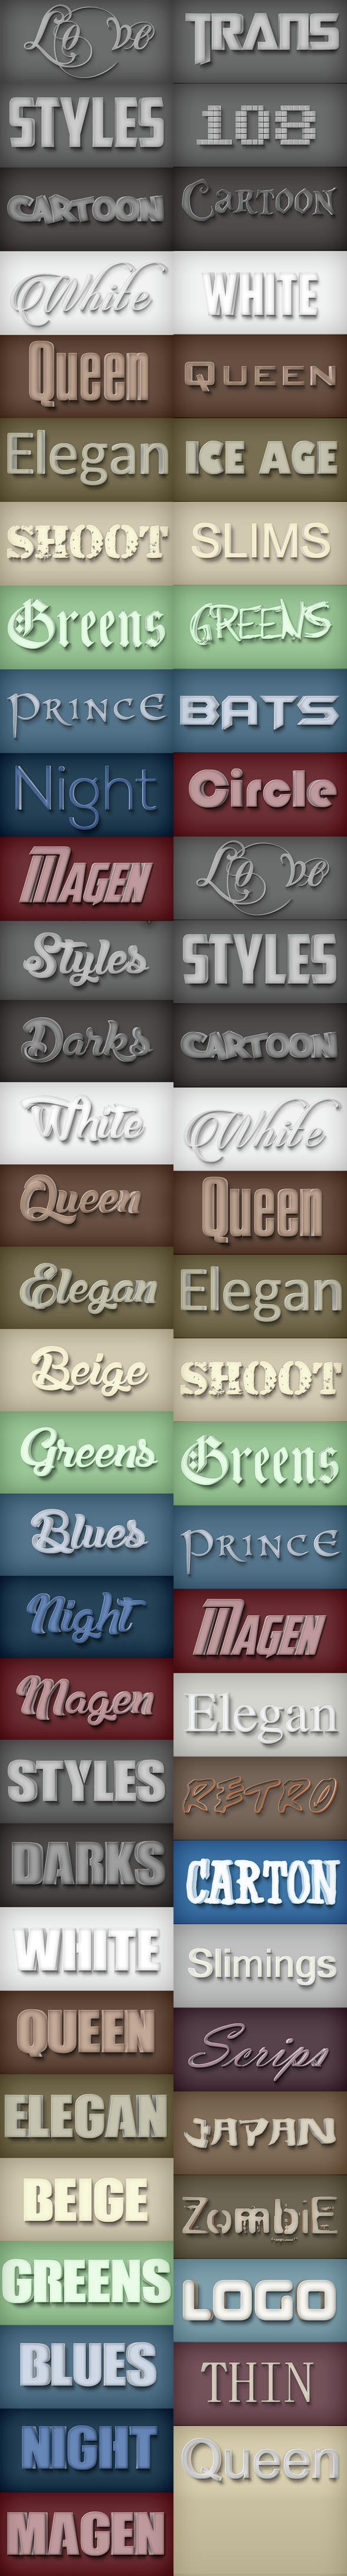 30 Bundle Elegant Styles Vol 1.3 - Styles Photoshop